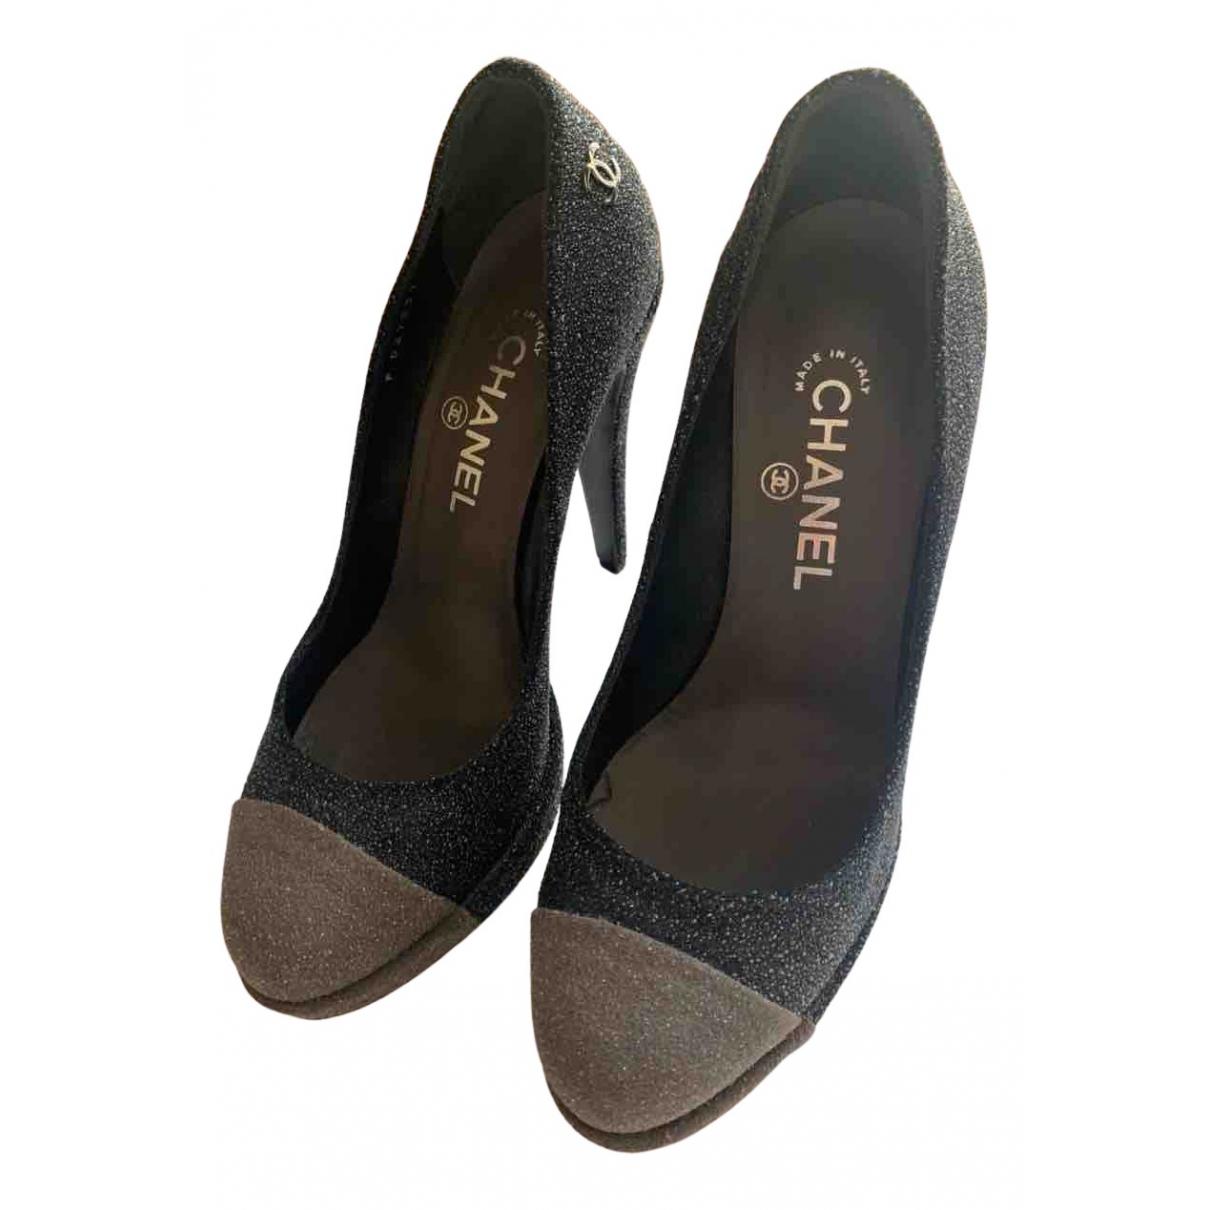 Chanel N Multicolour Cloth Heels for Women 38 EU